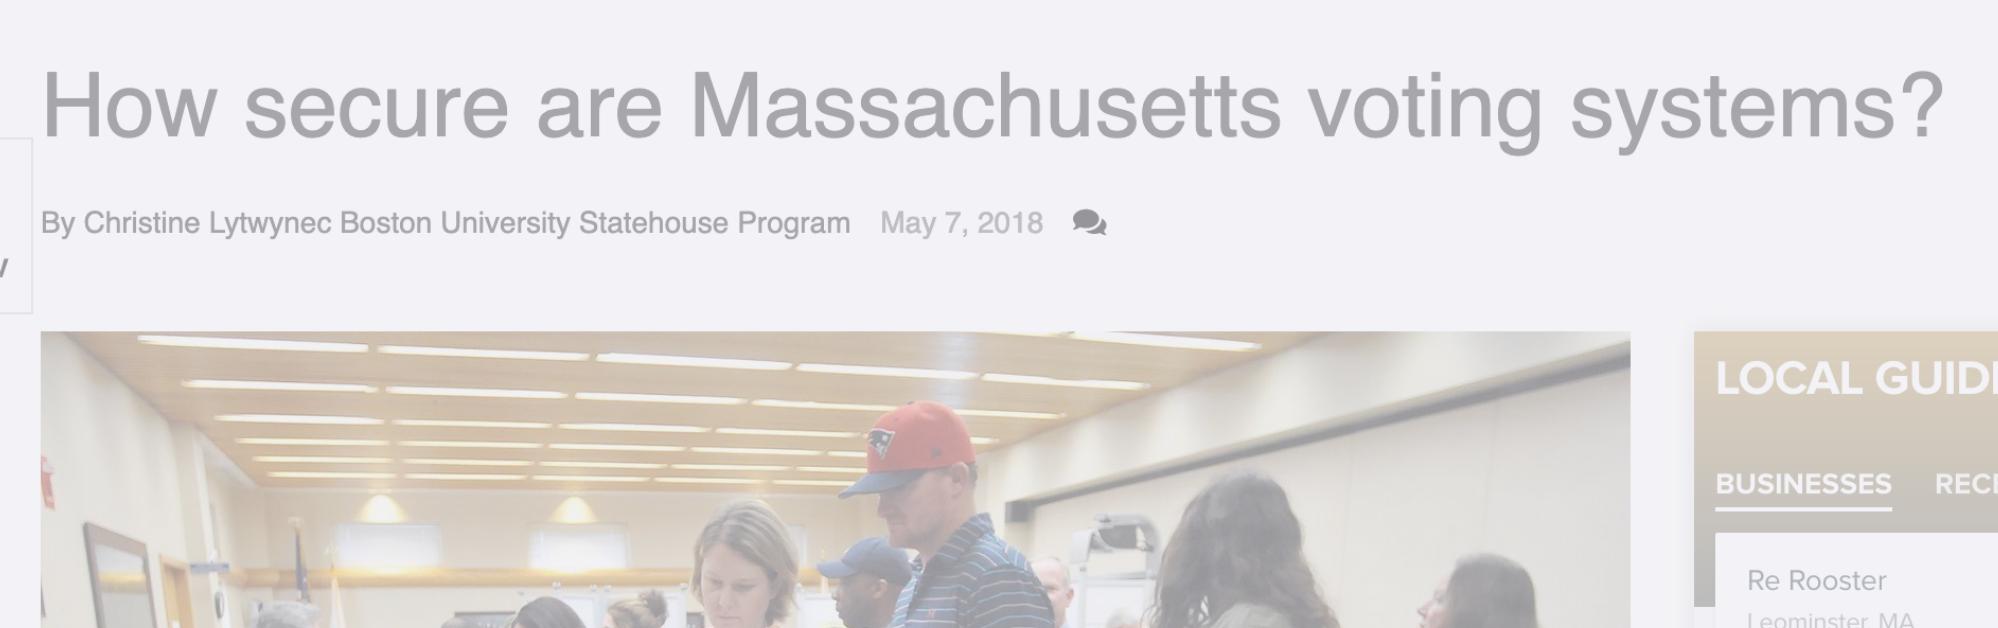 Mass-Voting_Statehouse